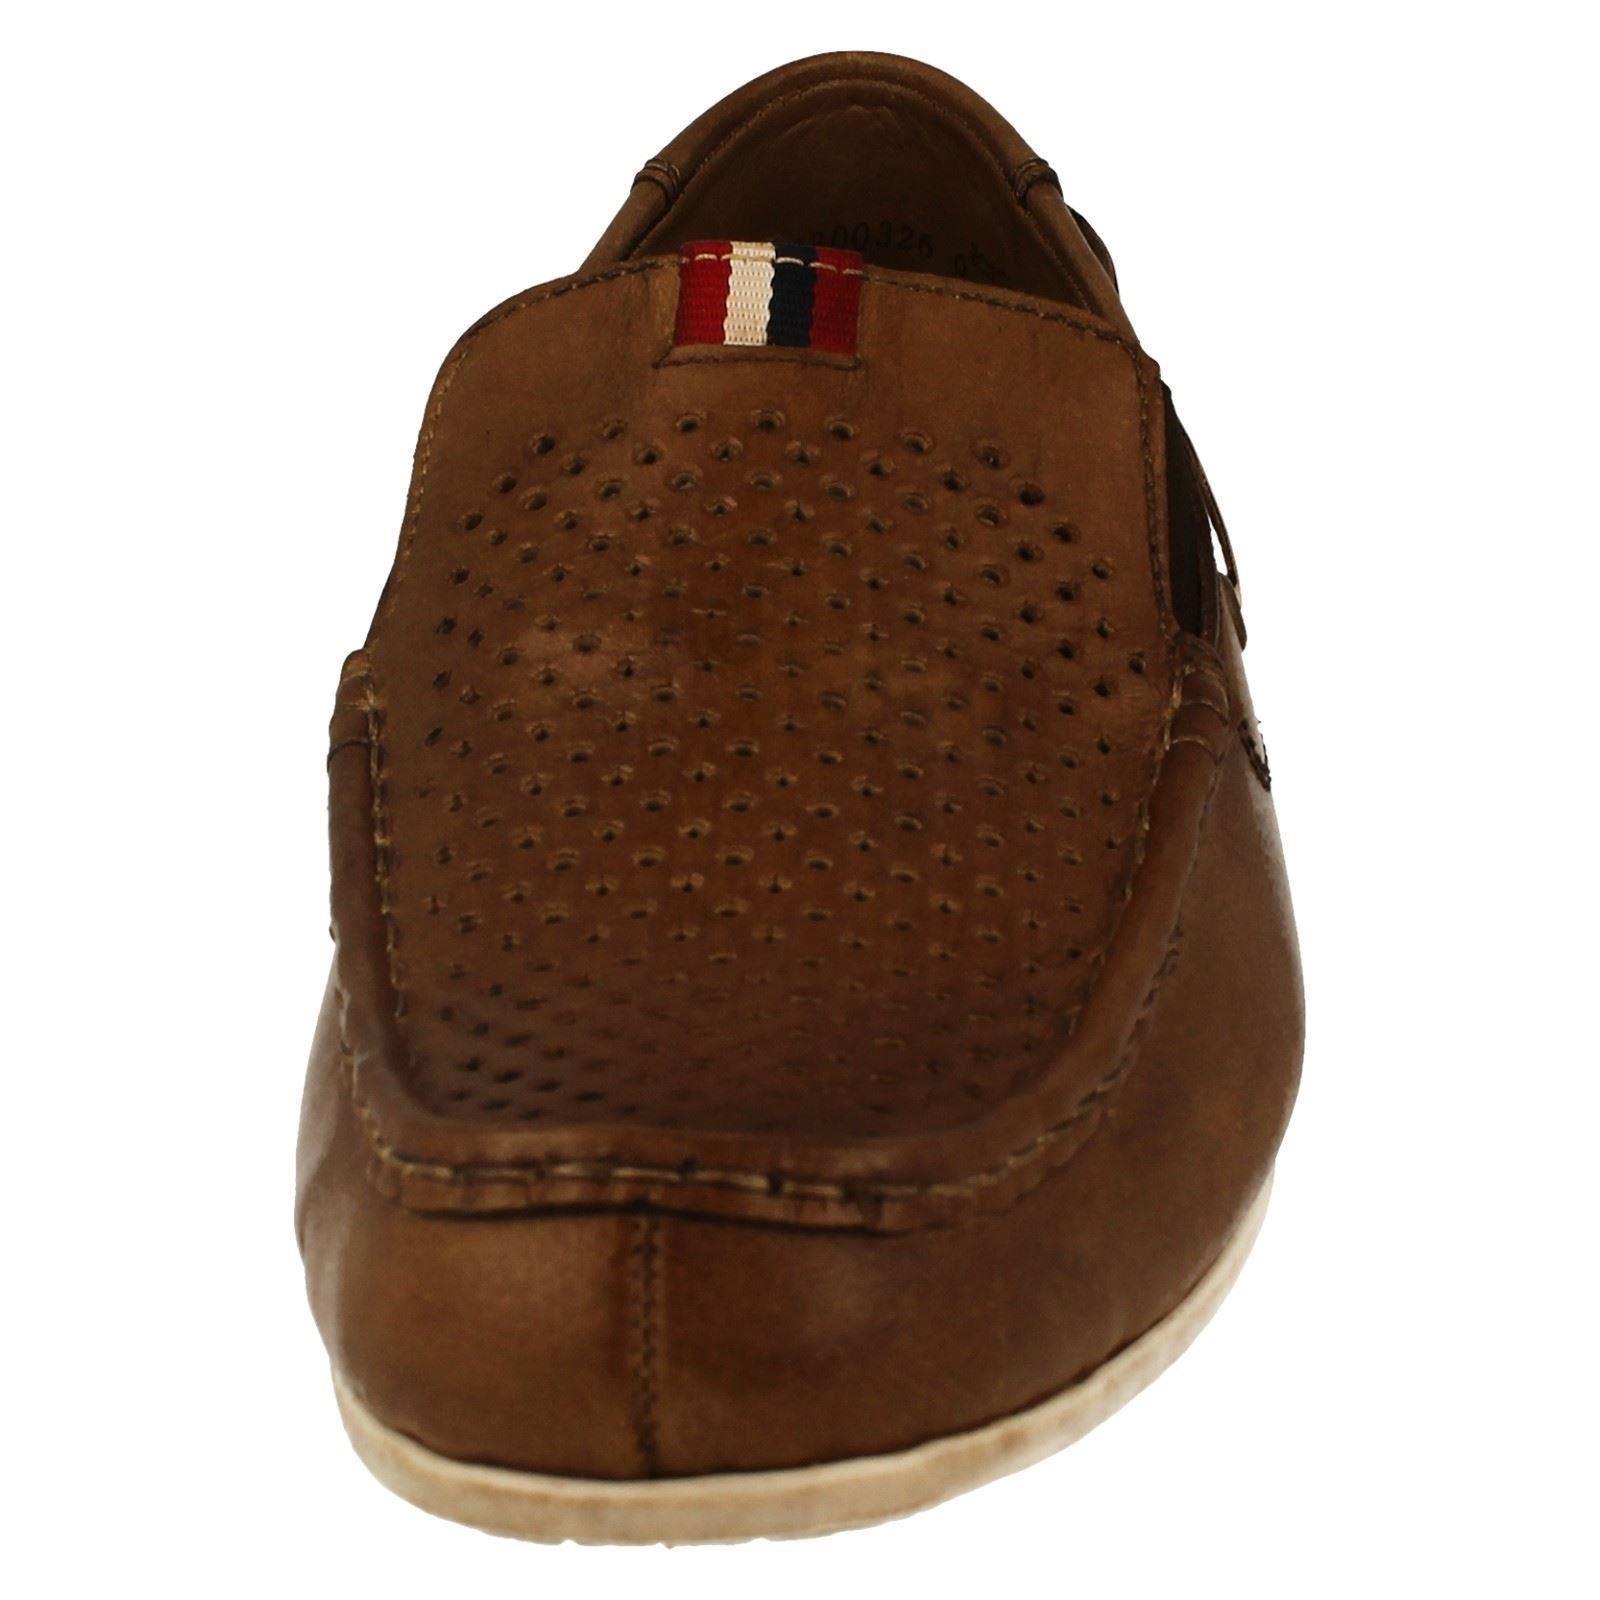 Uomo Rieker Summer Style Schuhes Style Summer 09765-W 559048